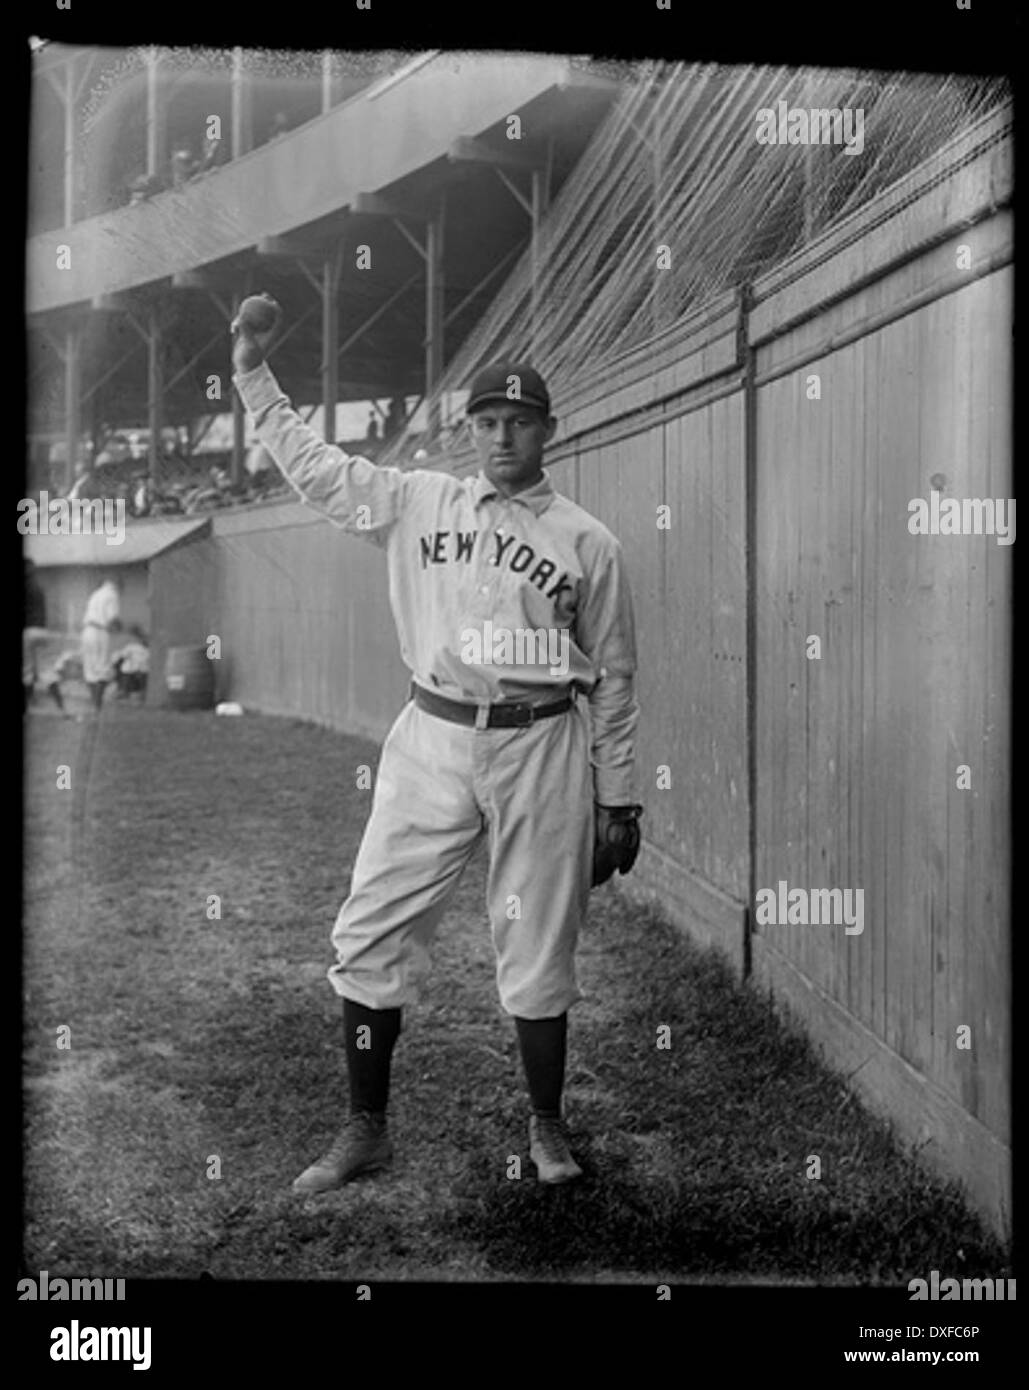 Portrait of Joe McGinnity, baseball player - Stock Image